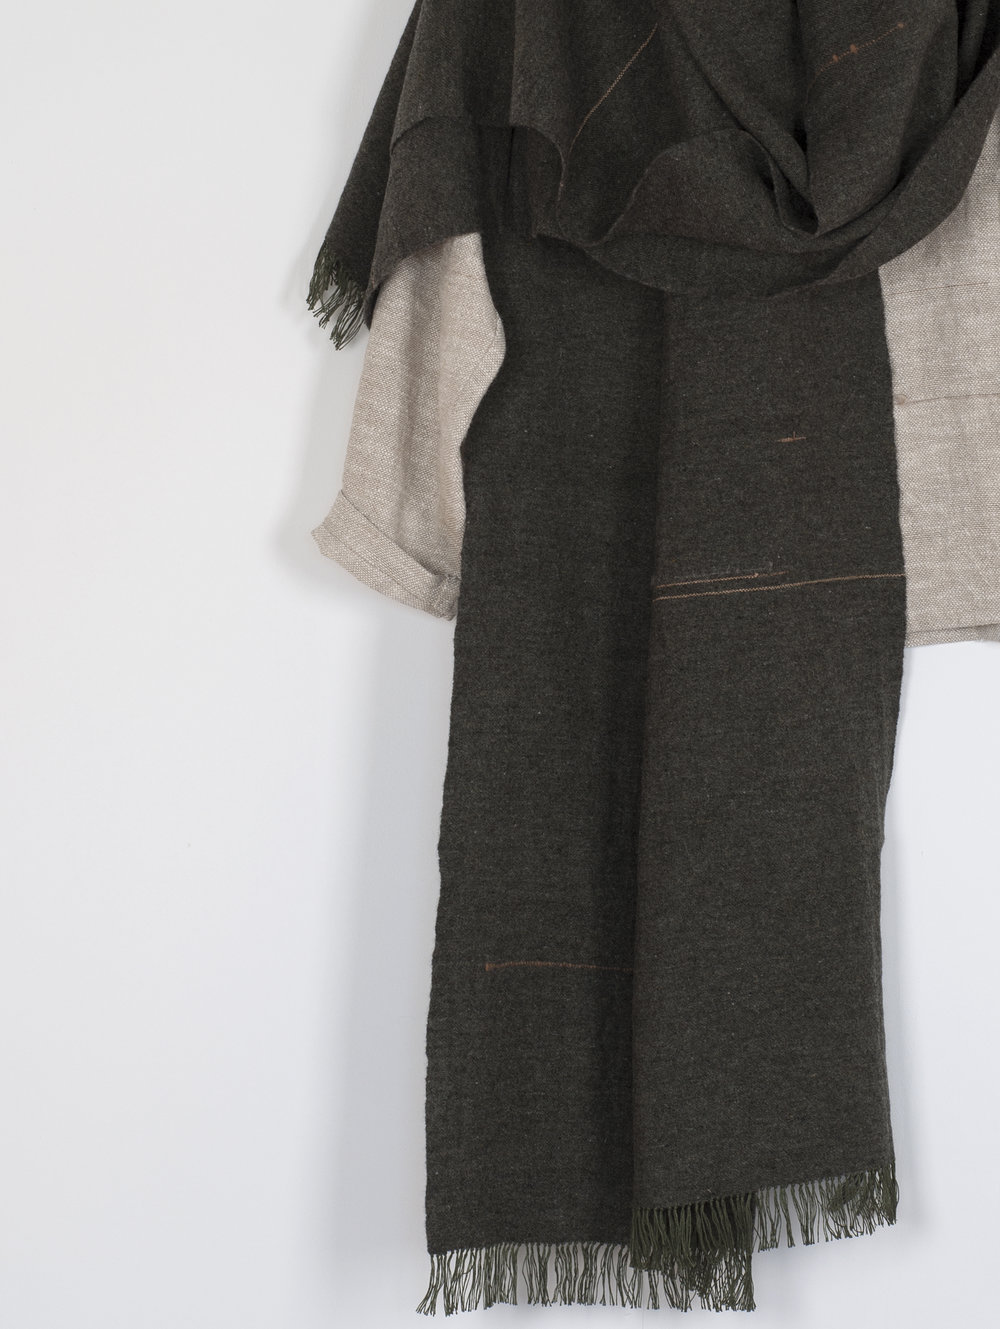 linen | shetland | kakishibu tokkenshi